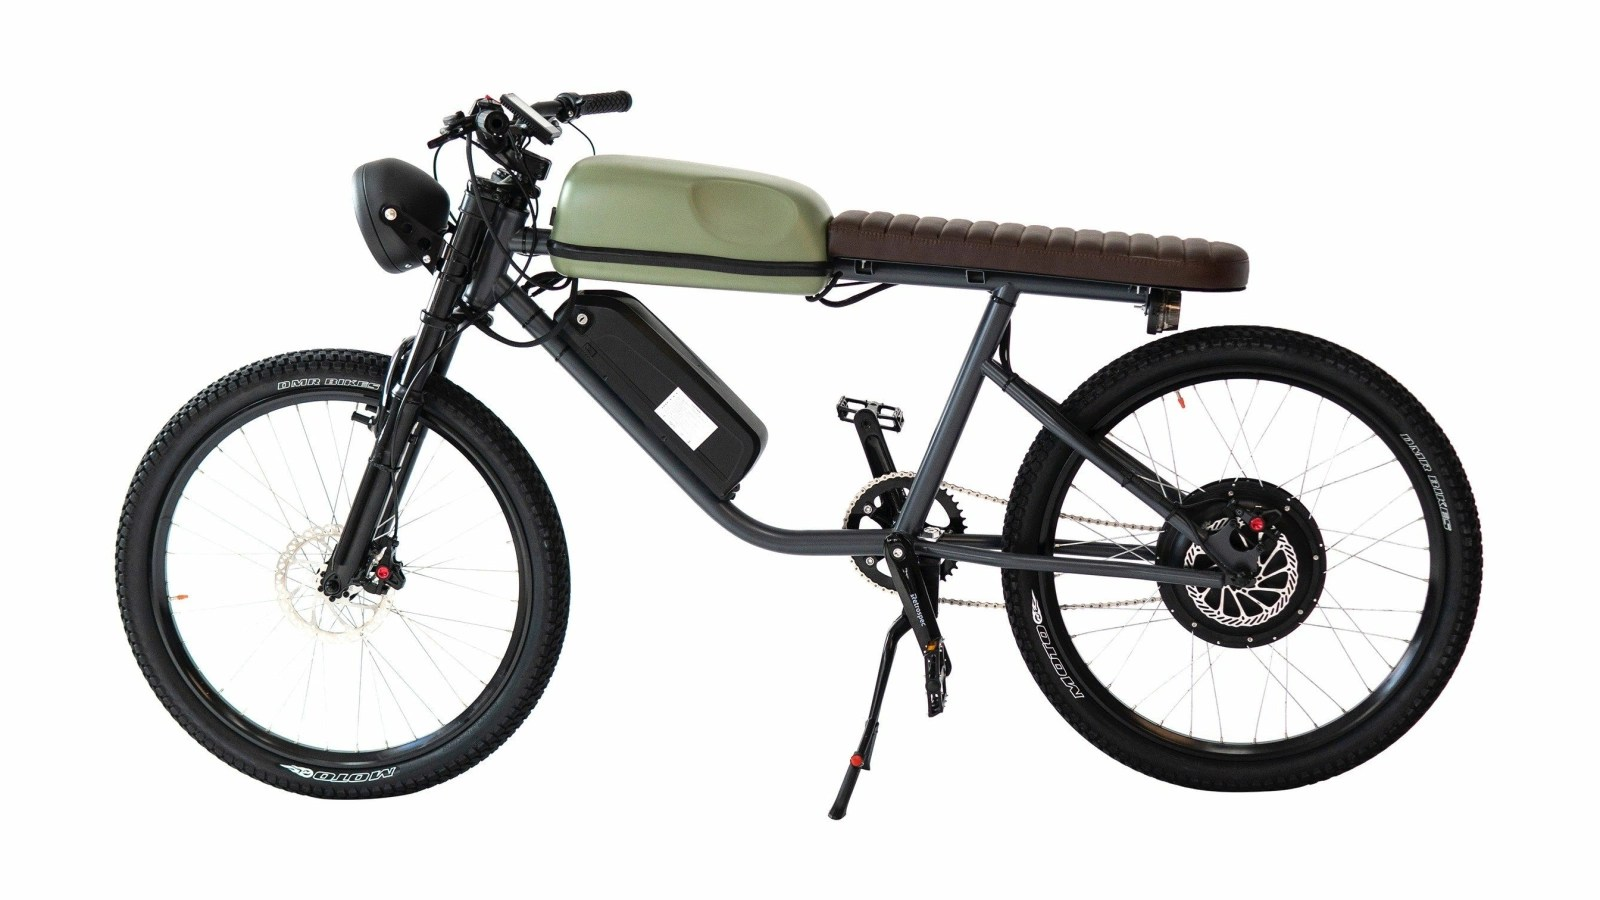 Titan R E Bike Mit 1 000 Watt Motor Fur 2 600 Euro